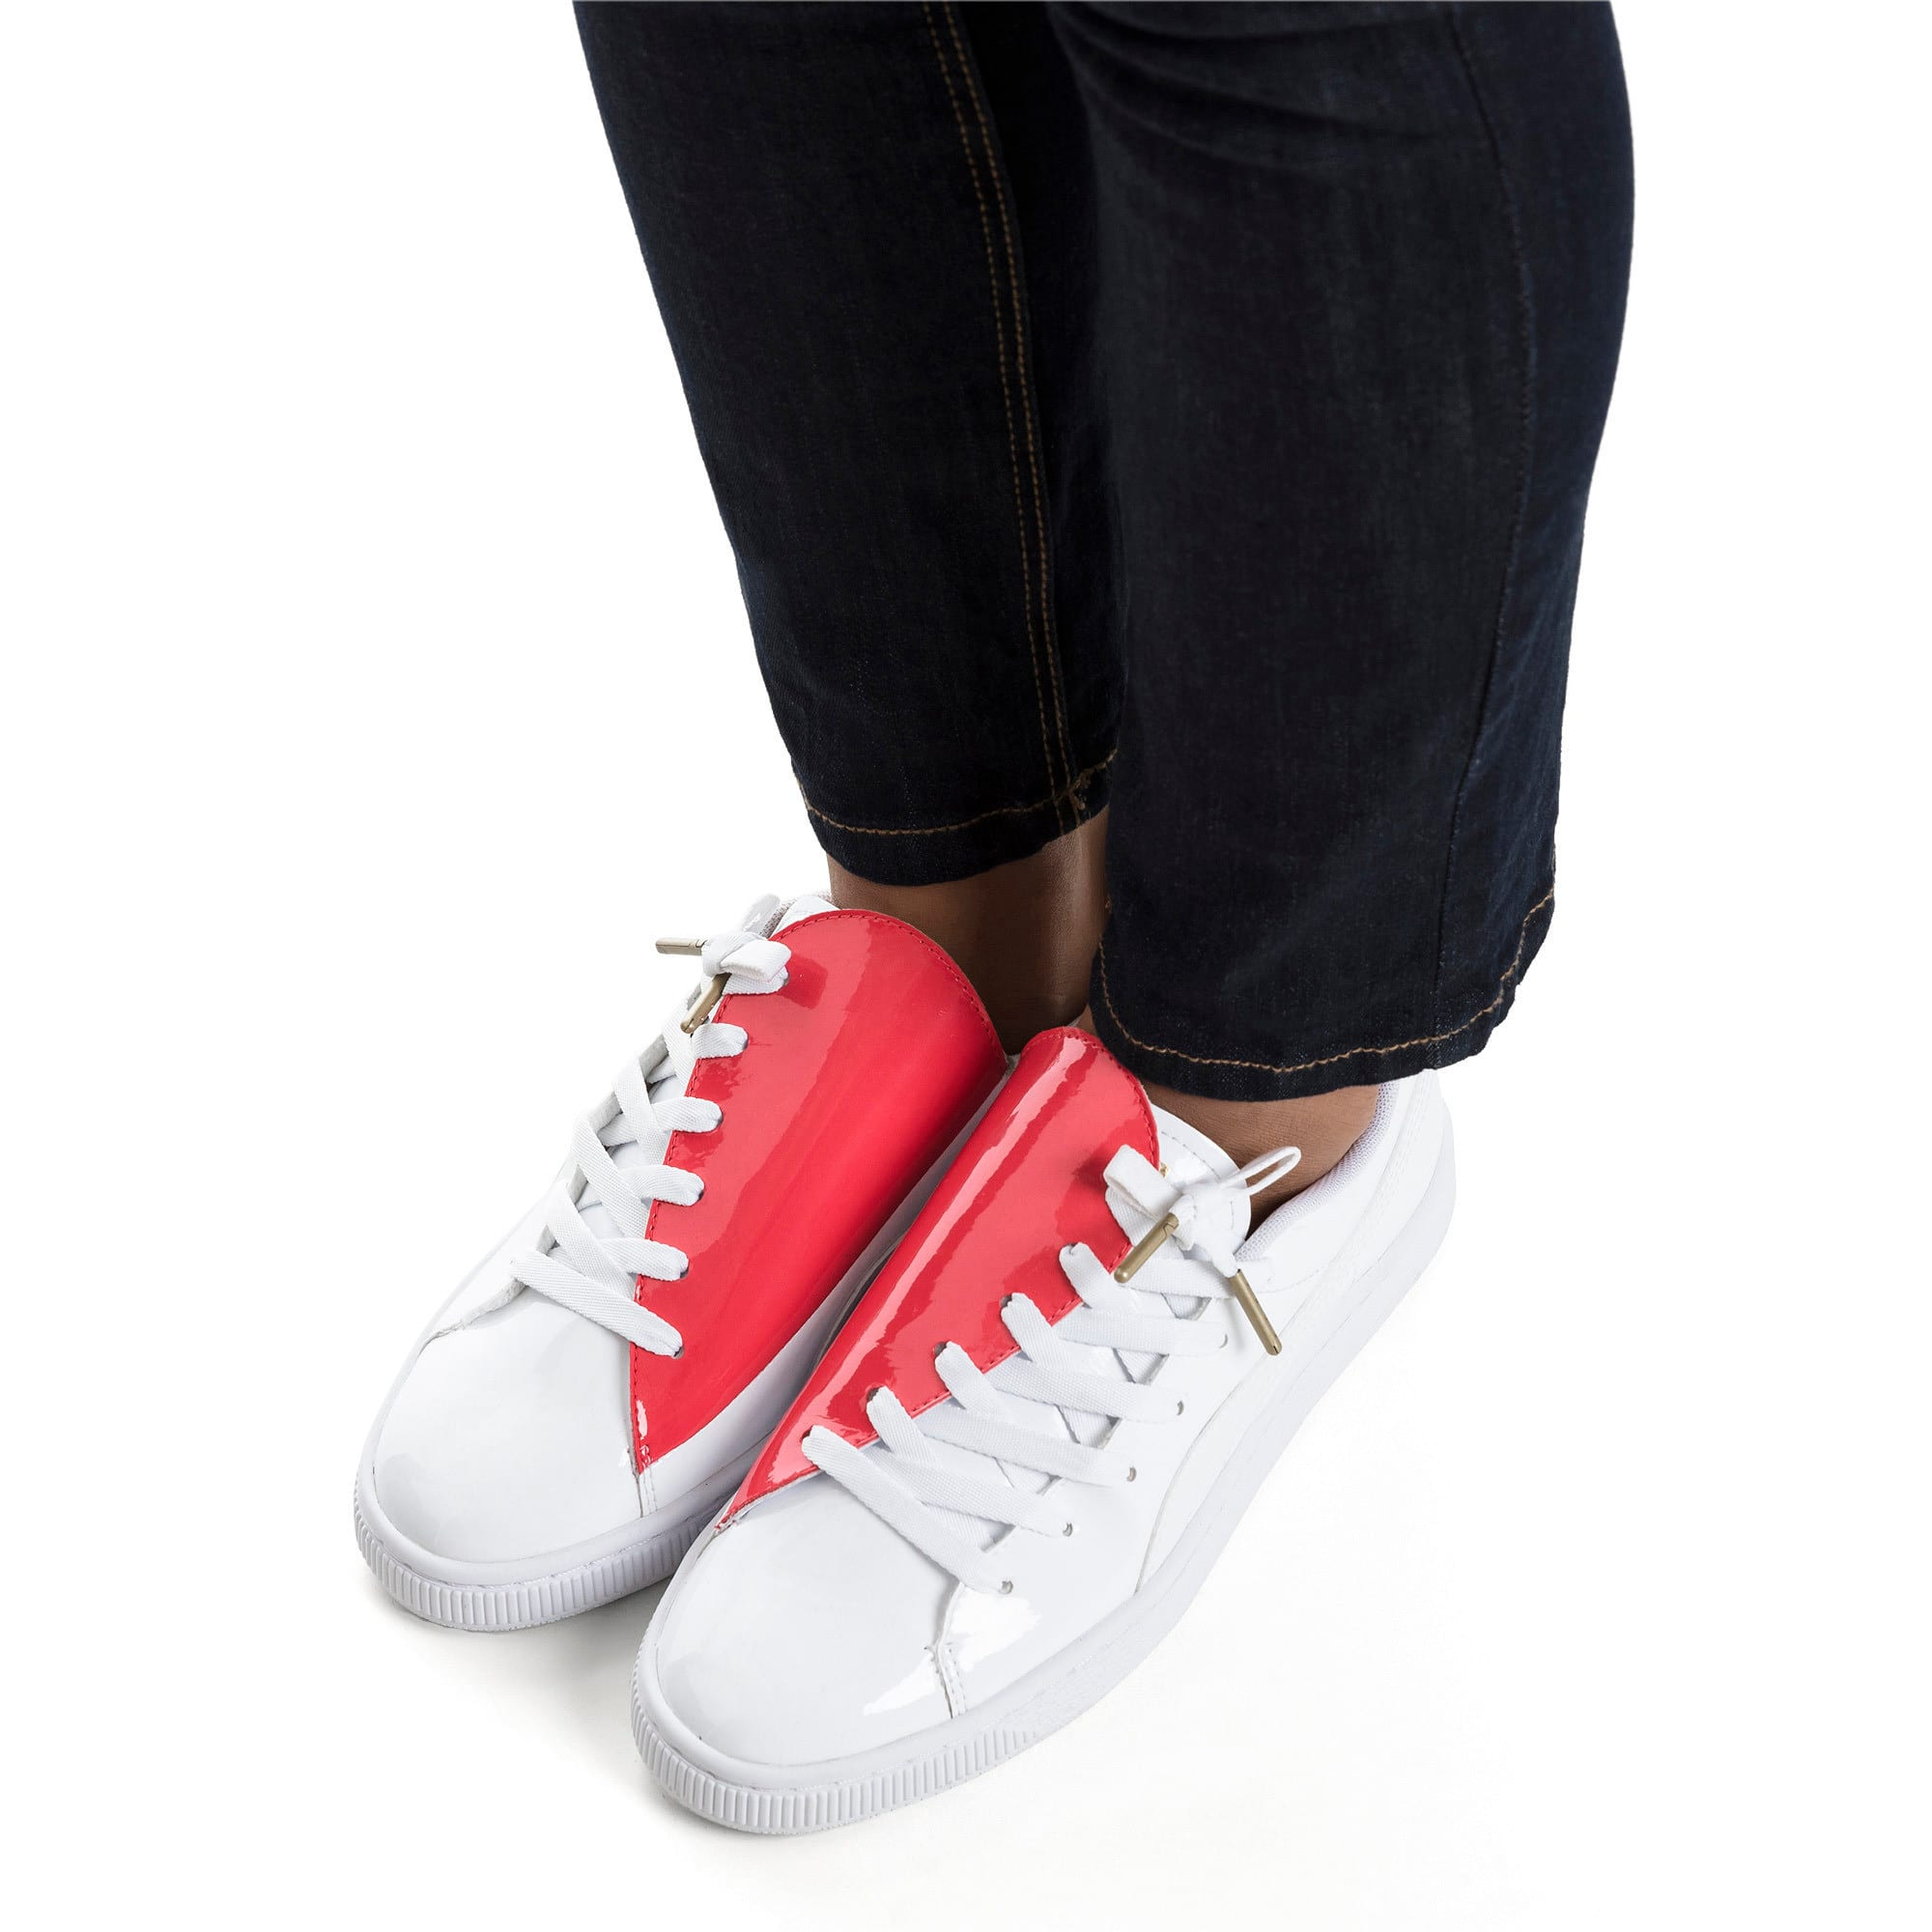 Thumbnail 2 of Basket Crush Women's Sneakers, Puma White-Hibiscus, medium